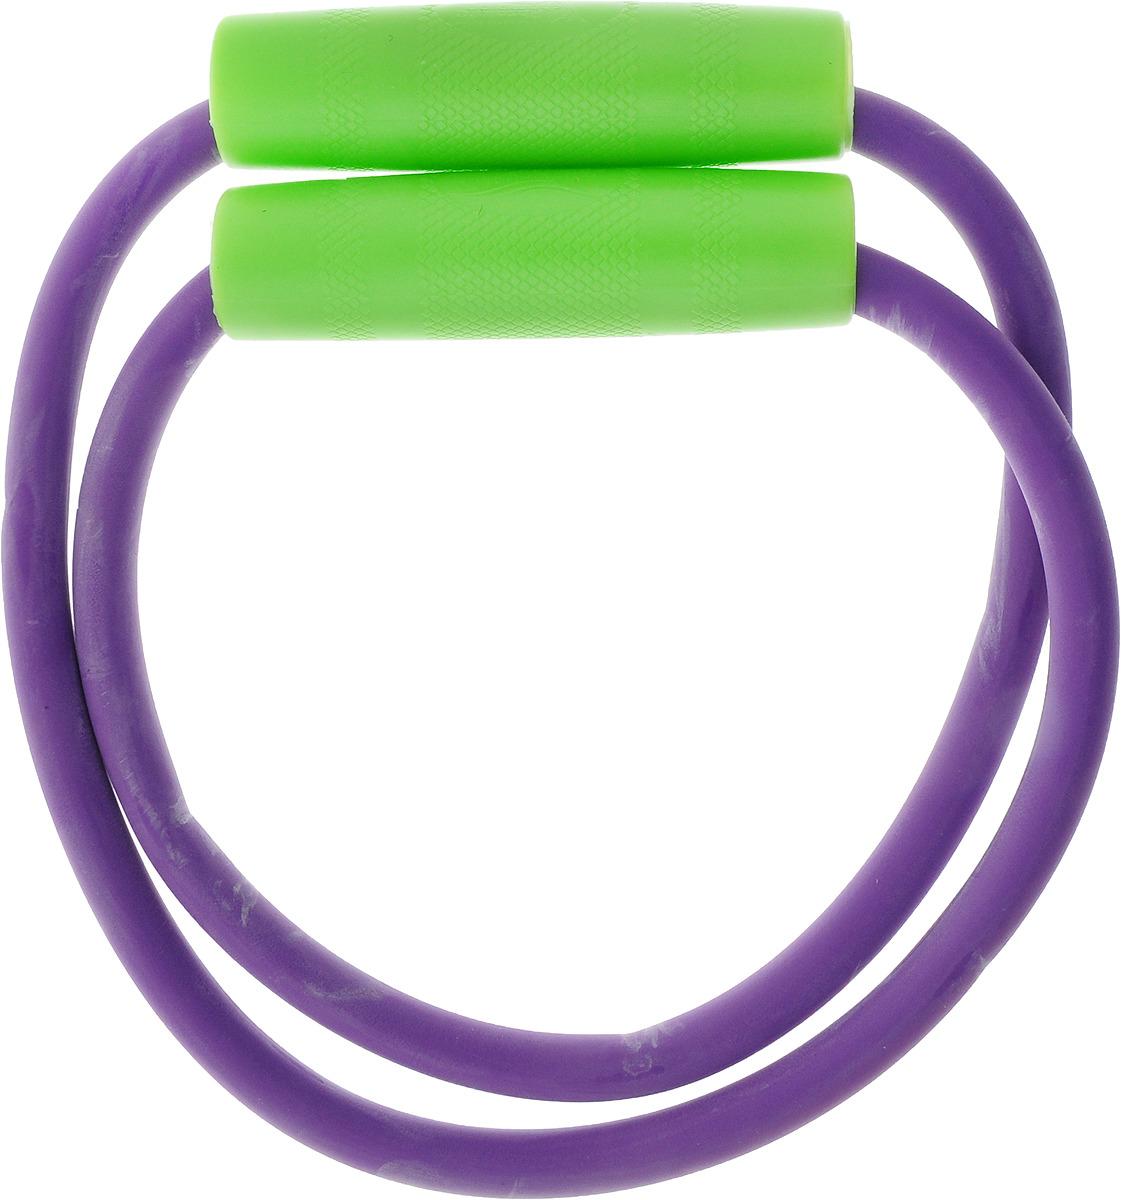 Эспандер-кольцо Absolute Champion, 4690337034067, фиолетовый эспандер absolute champion с разборной ручкой